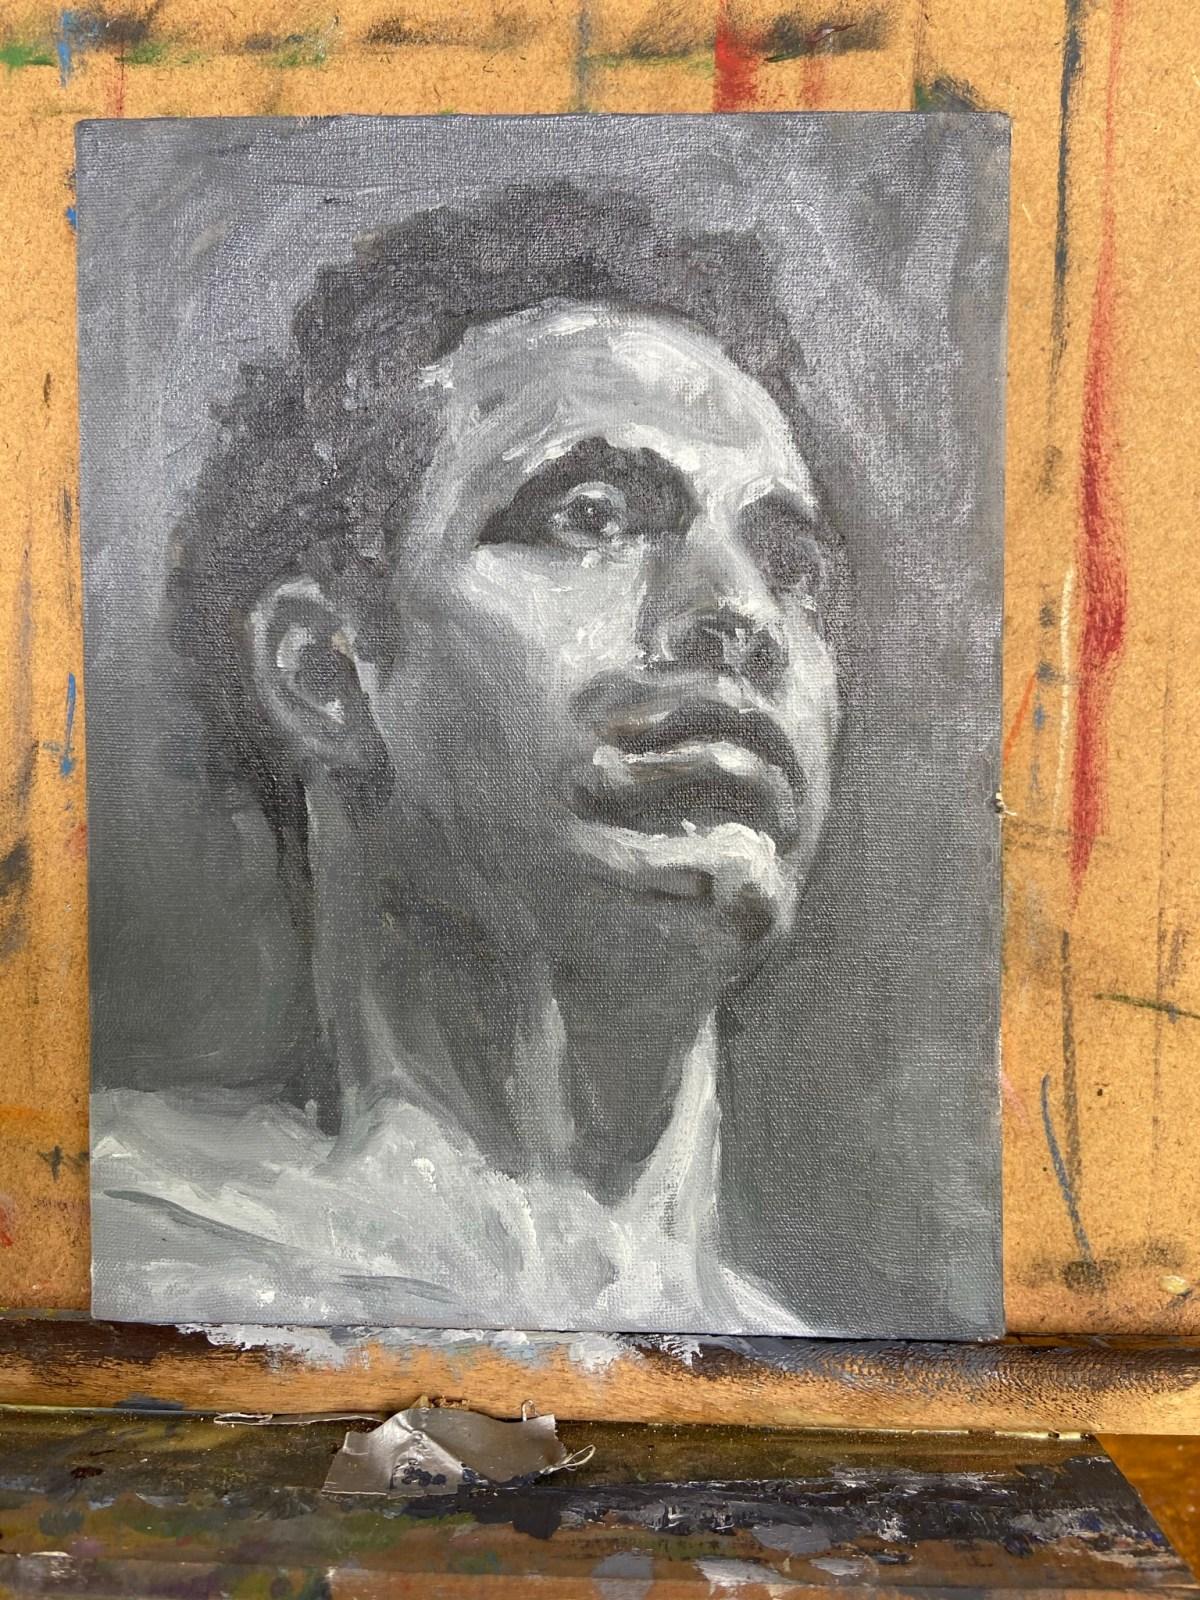 """Retratos conttemporâneos - 12"", Justino, óleo em canvas board, 2021."